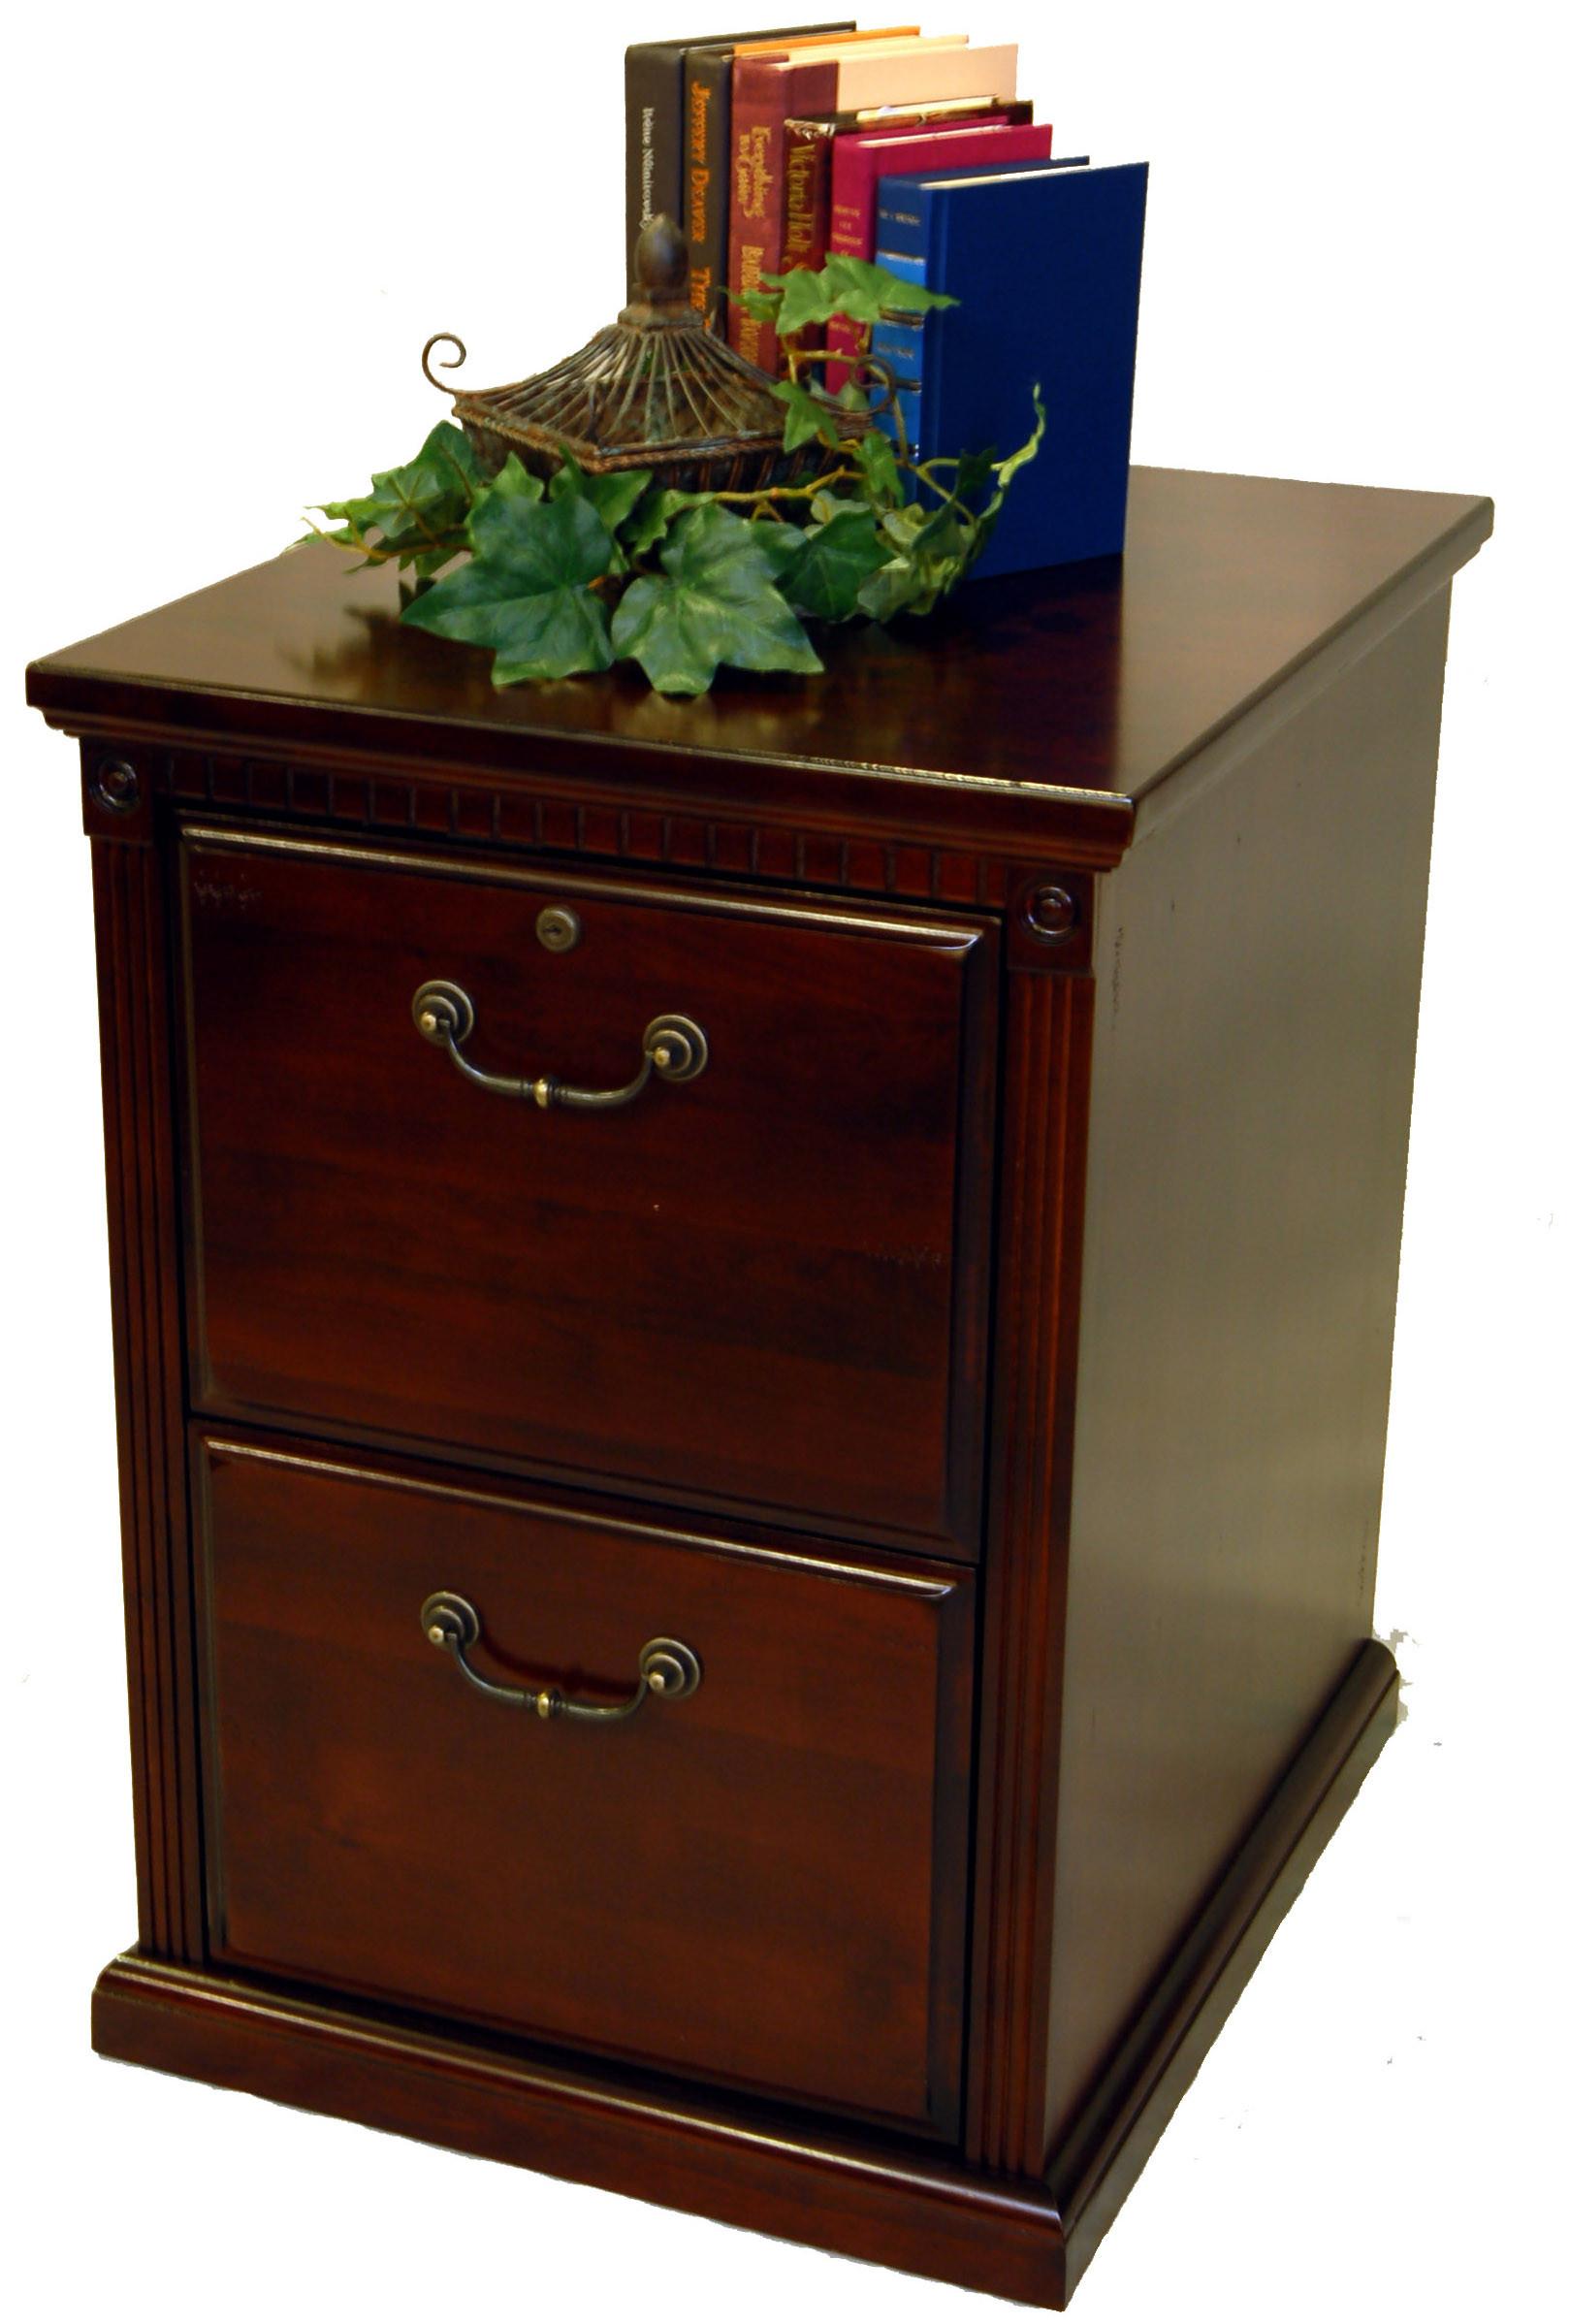 Best ideas about Walmart Filing Cabinet . Save or Pin Locking Wood File Cabinet richfielduniversity Now.